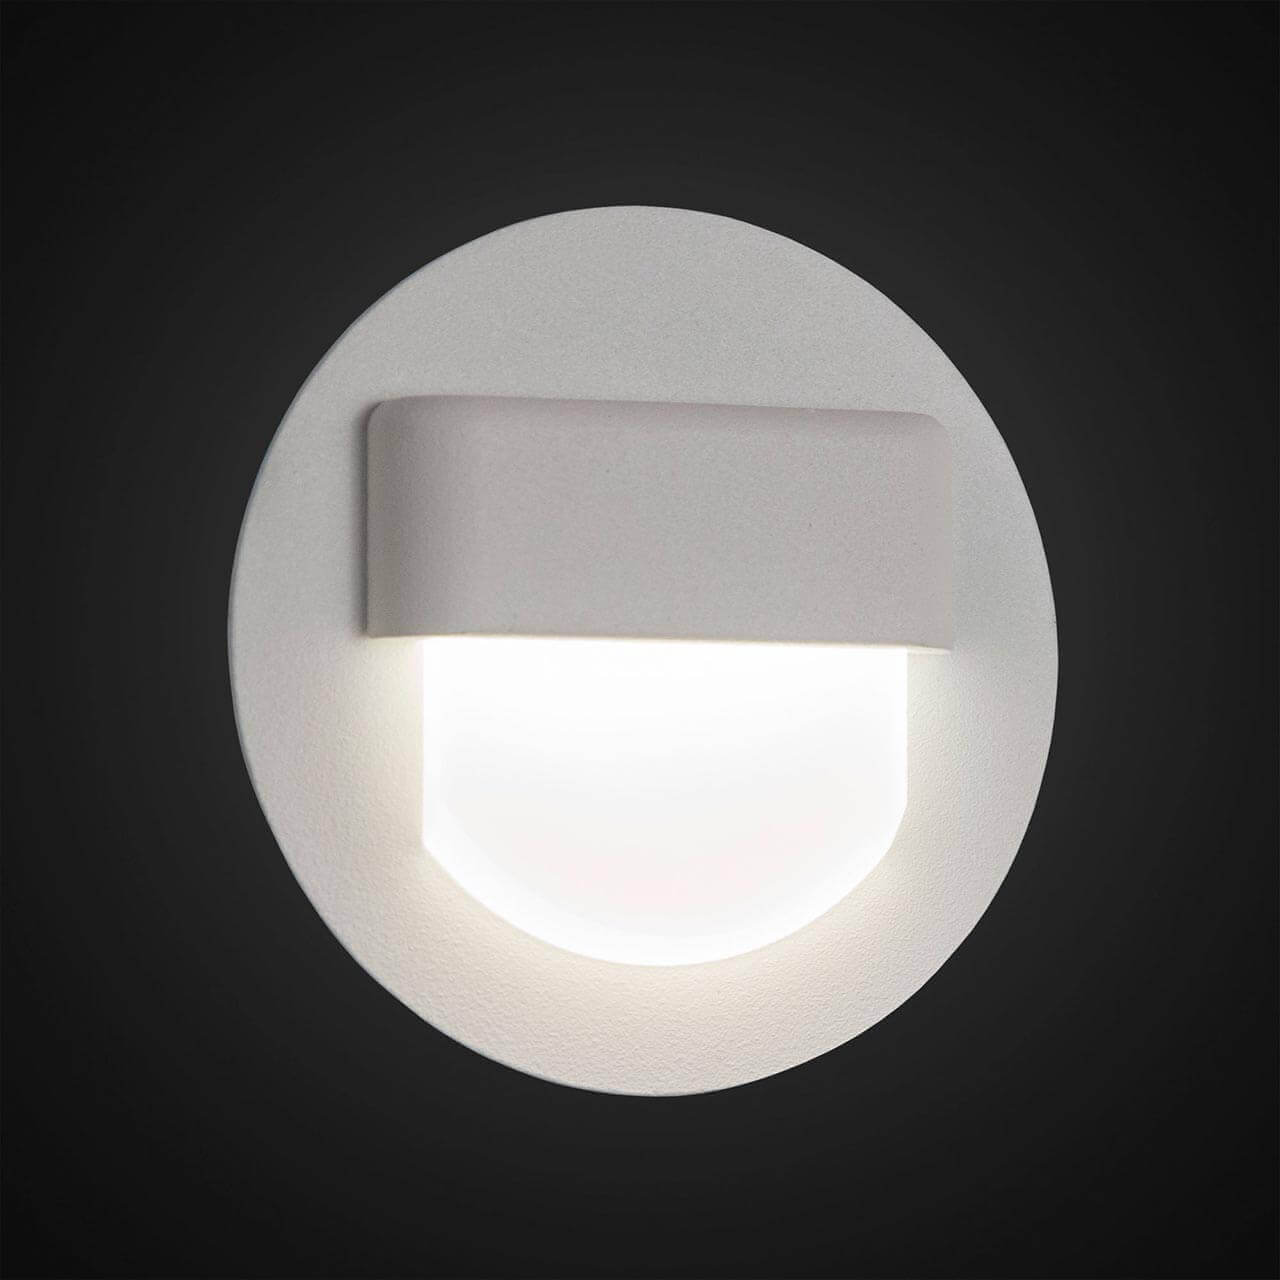 Светильник Citilux CLD006R0 Скалли